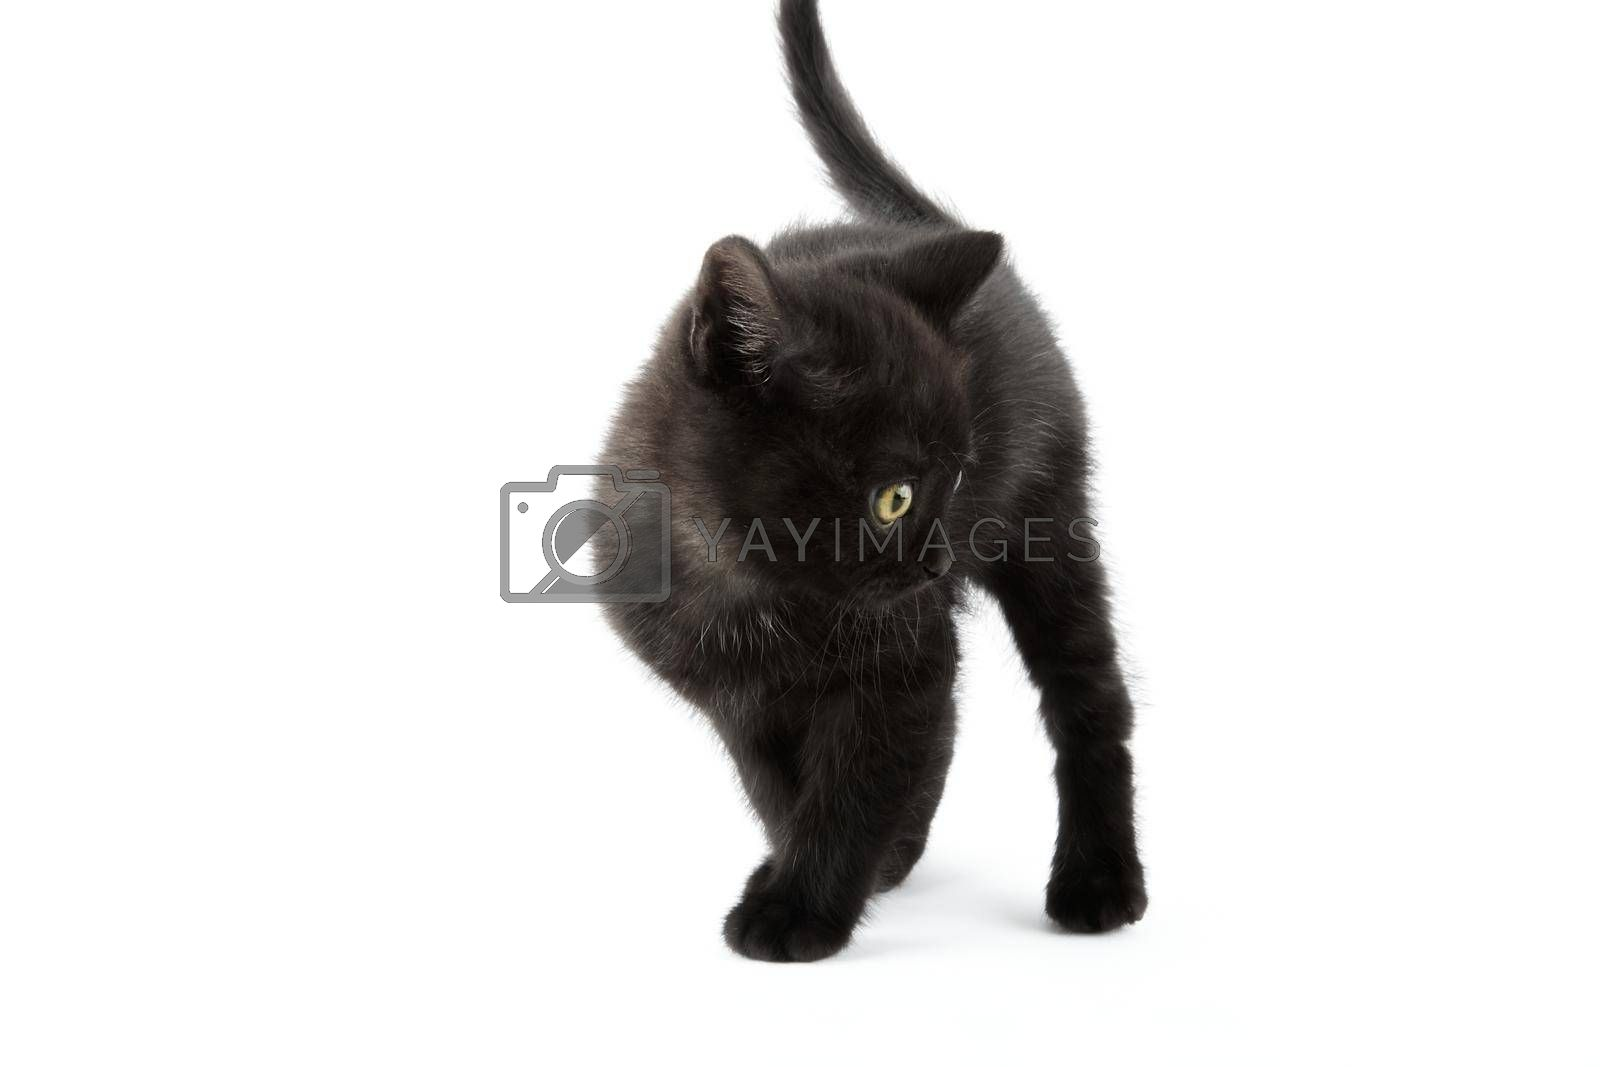 Small black British Shorthair kitten isolated on white background.